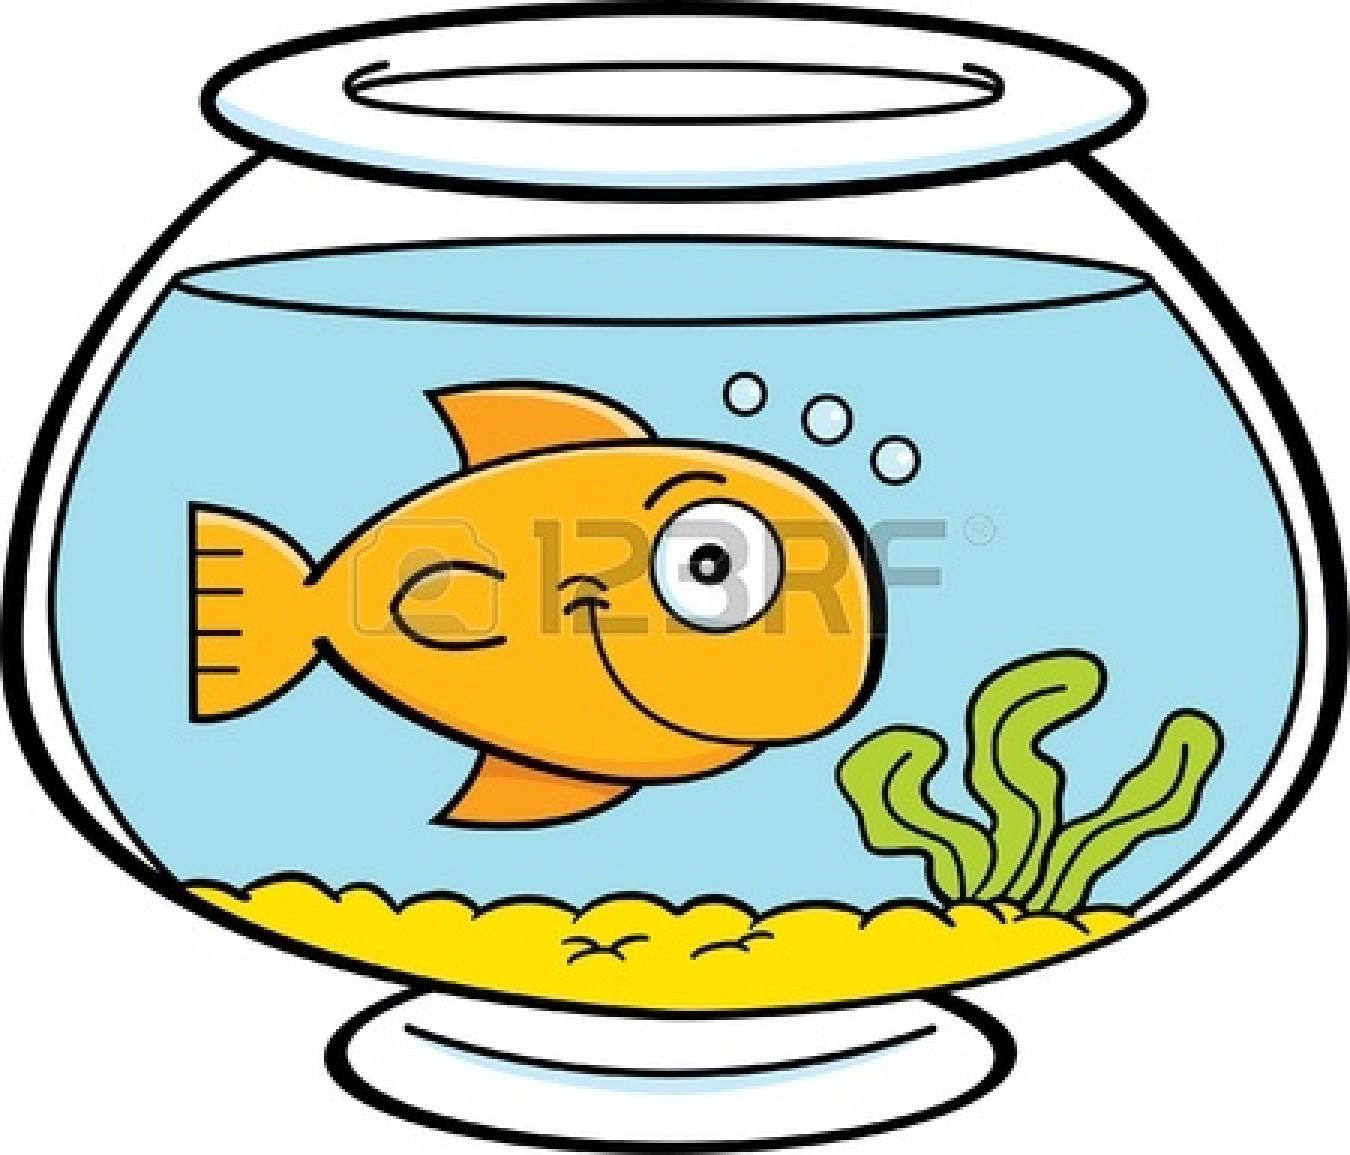 1350x1155 Aquarium Clipart Fish Bowl